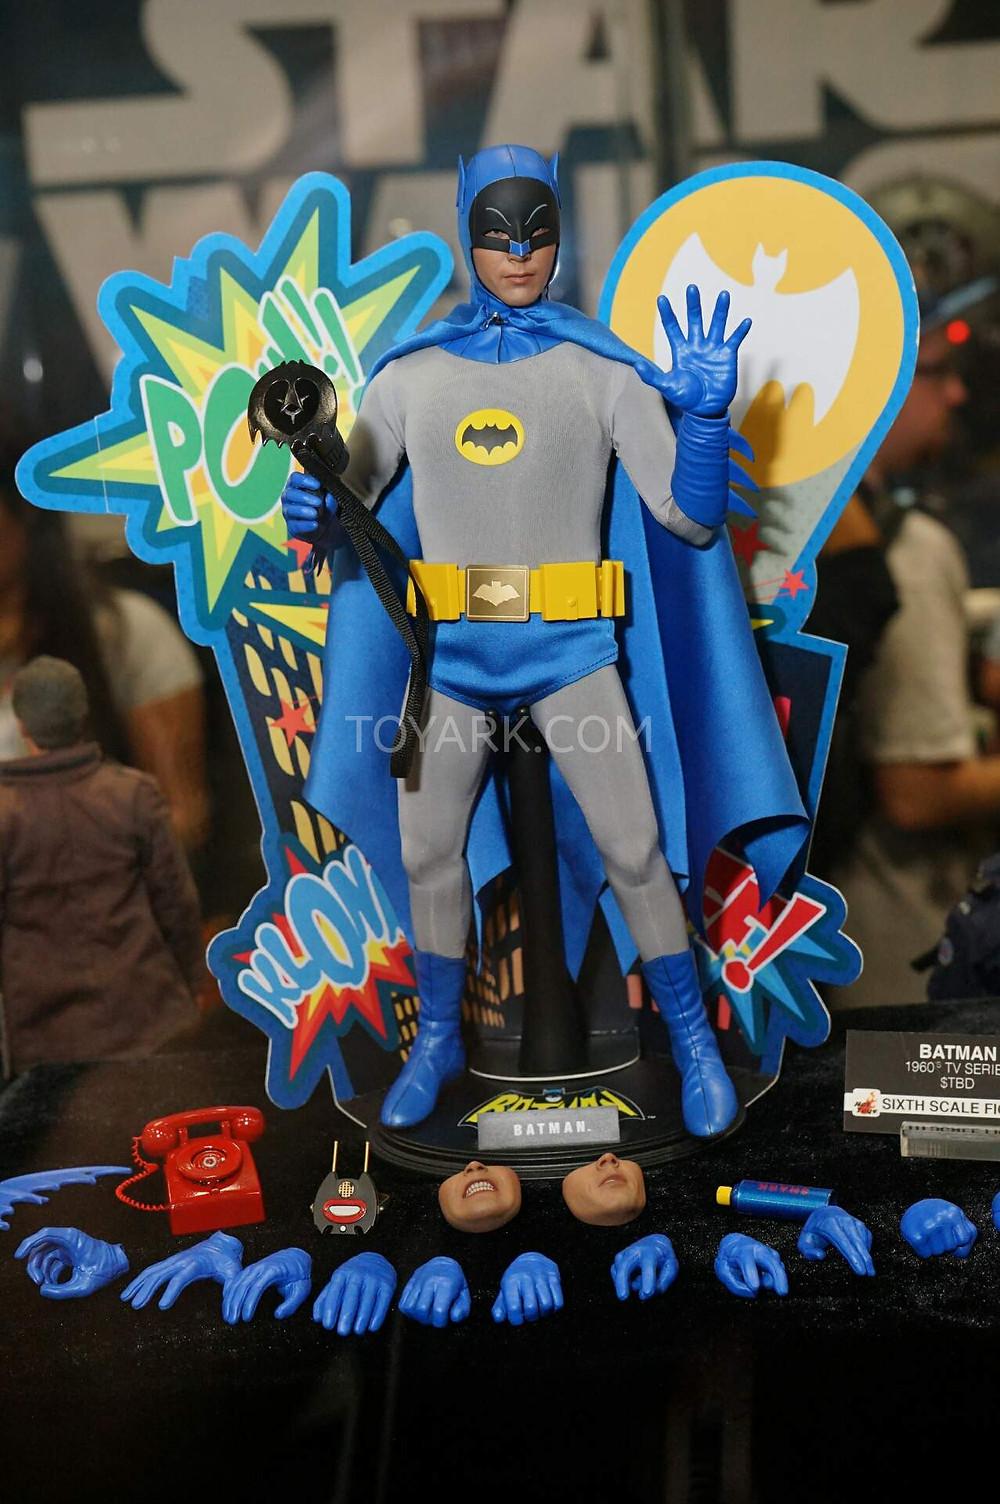 SDCC2015-Hot-Toys-Batman-Line-006.jpg